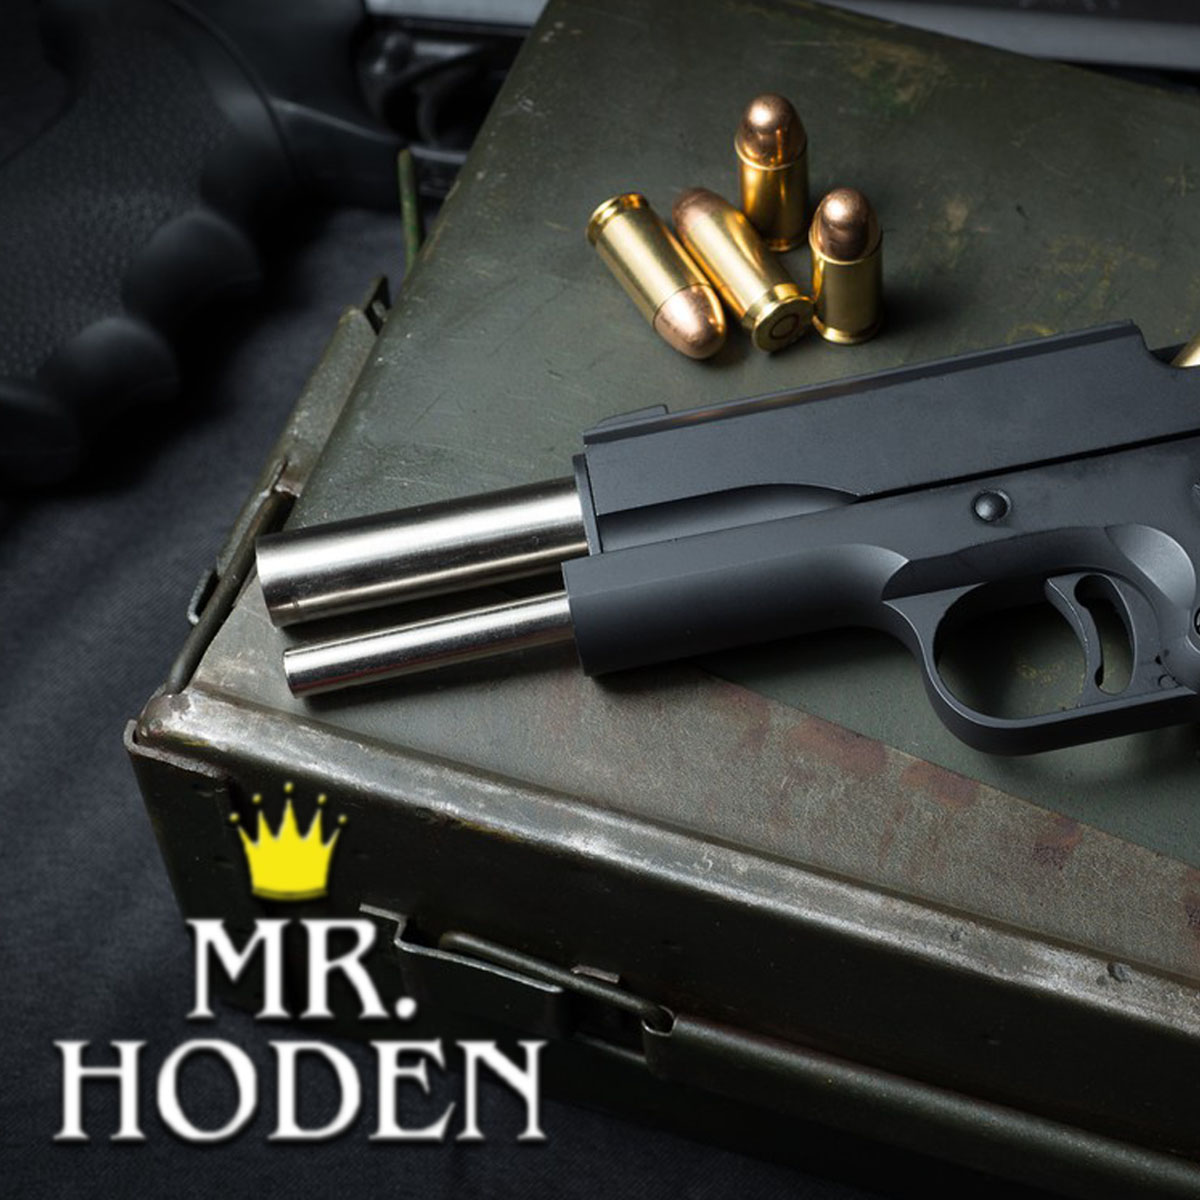 Upcoming: Mr. Hoden - Sick Hard Rap Beat 2020 [FREE BEAT]